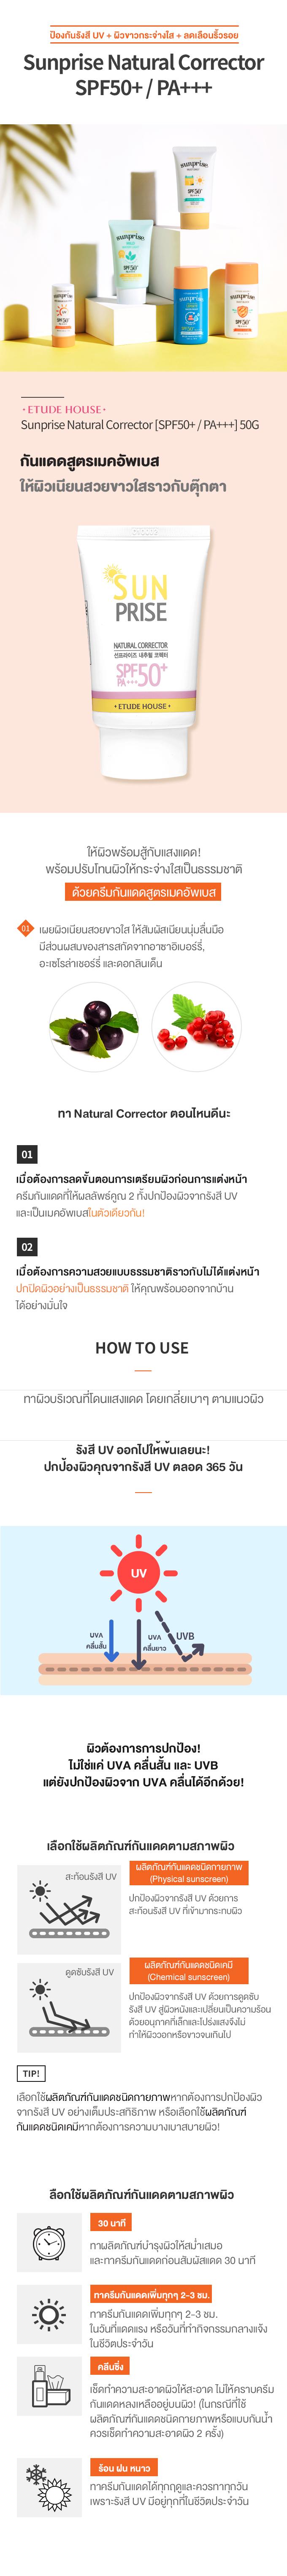 TH1_Sunprise_Natural Corrector